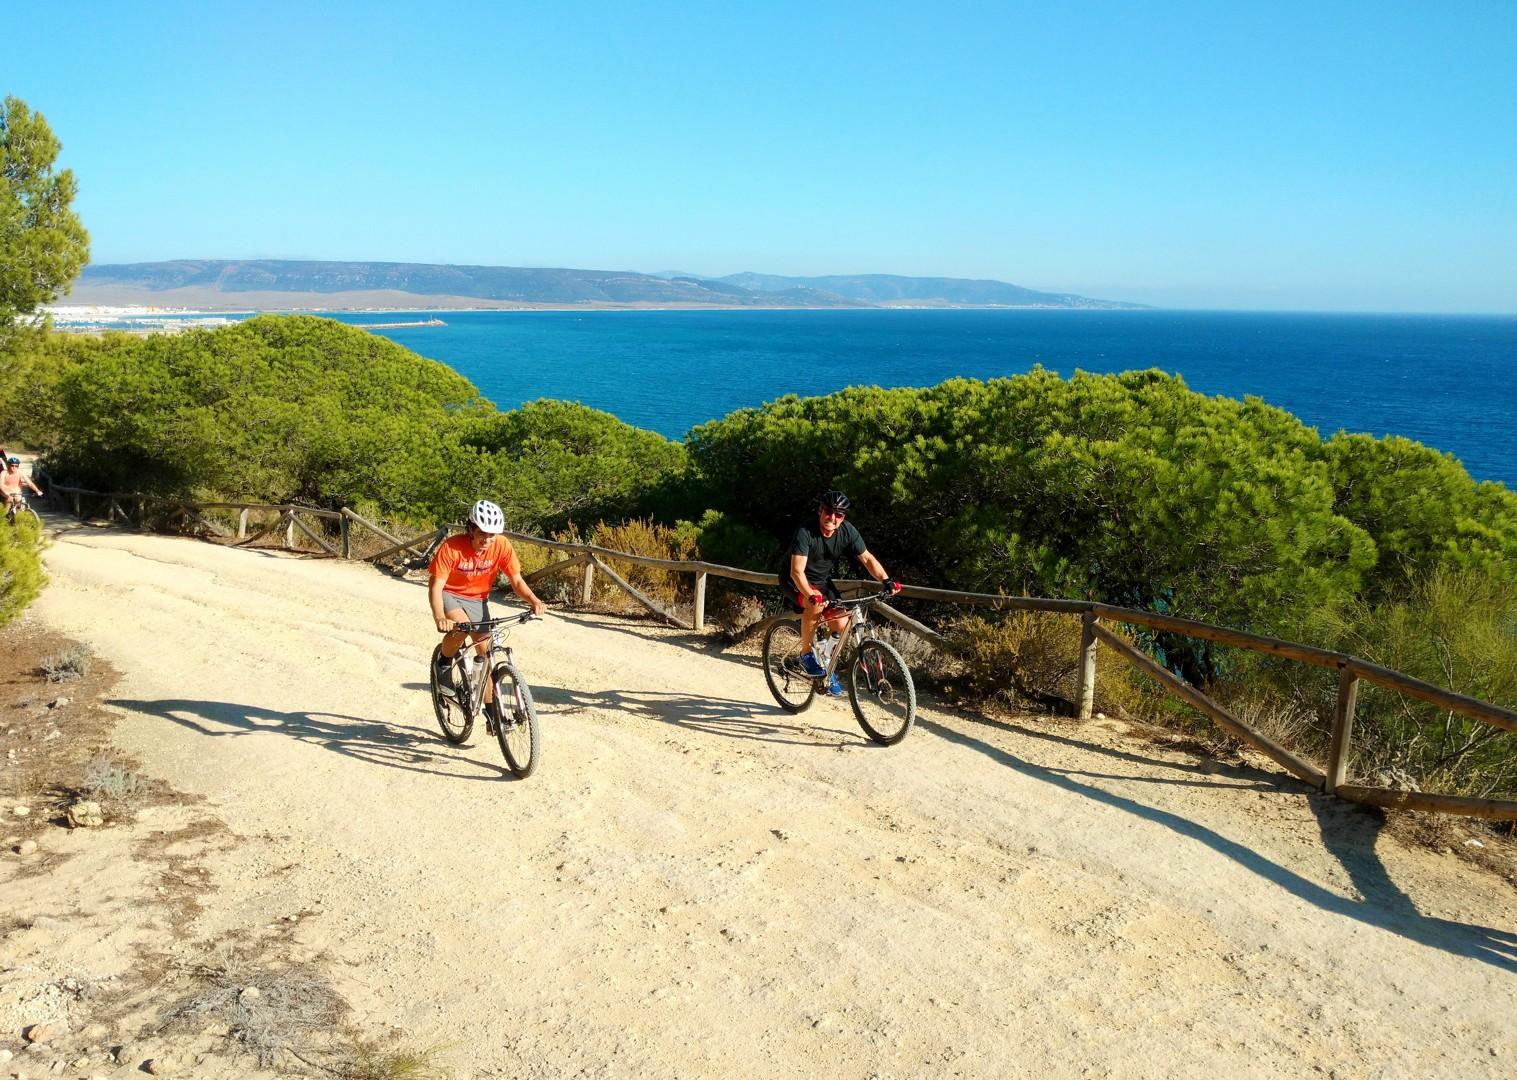 IMG_20171025_170151830.jpg - Southern Spain - Coastal Adventurer - Family Cycling